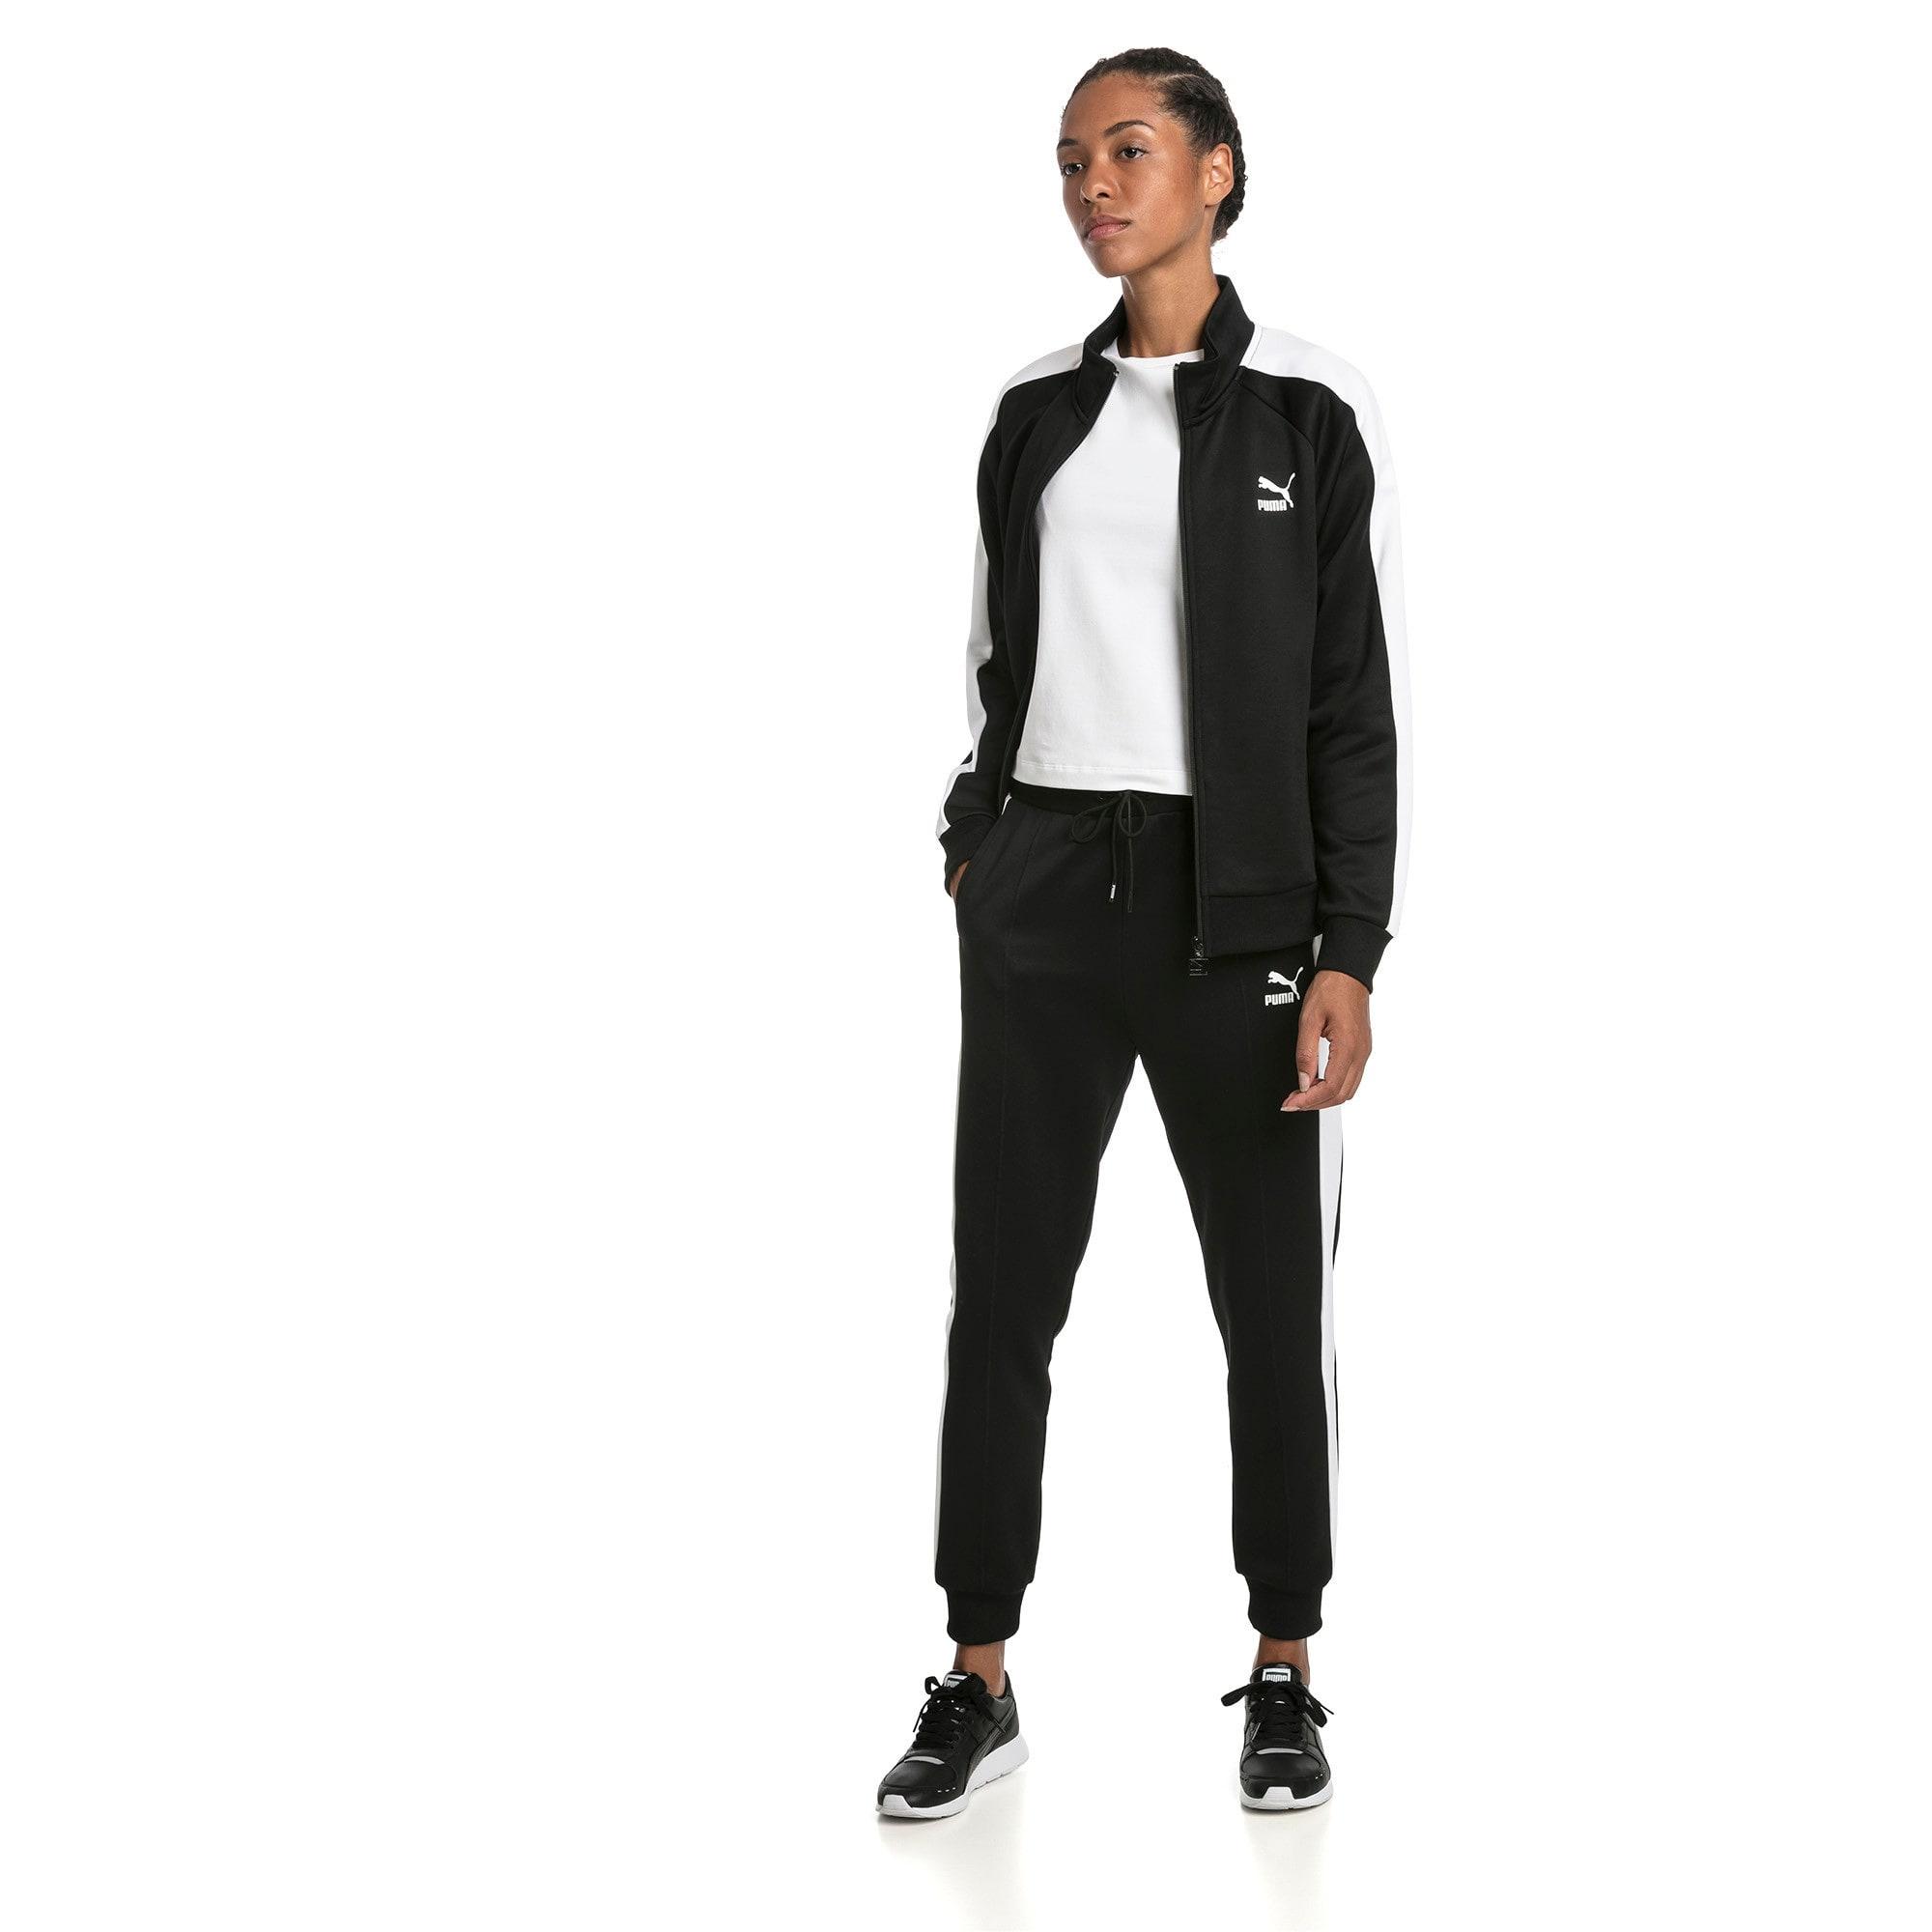 Thumbnail 3 of Classics T7 Knitted Women's Track Pants, Puma Black, medium